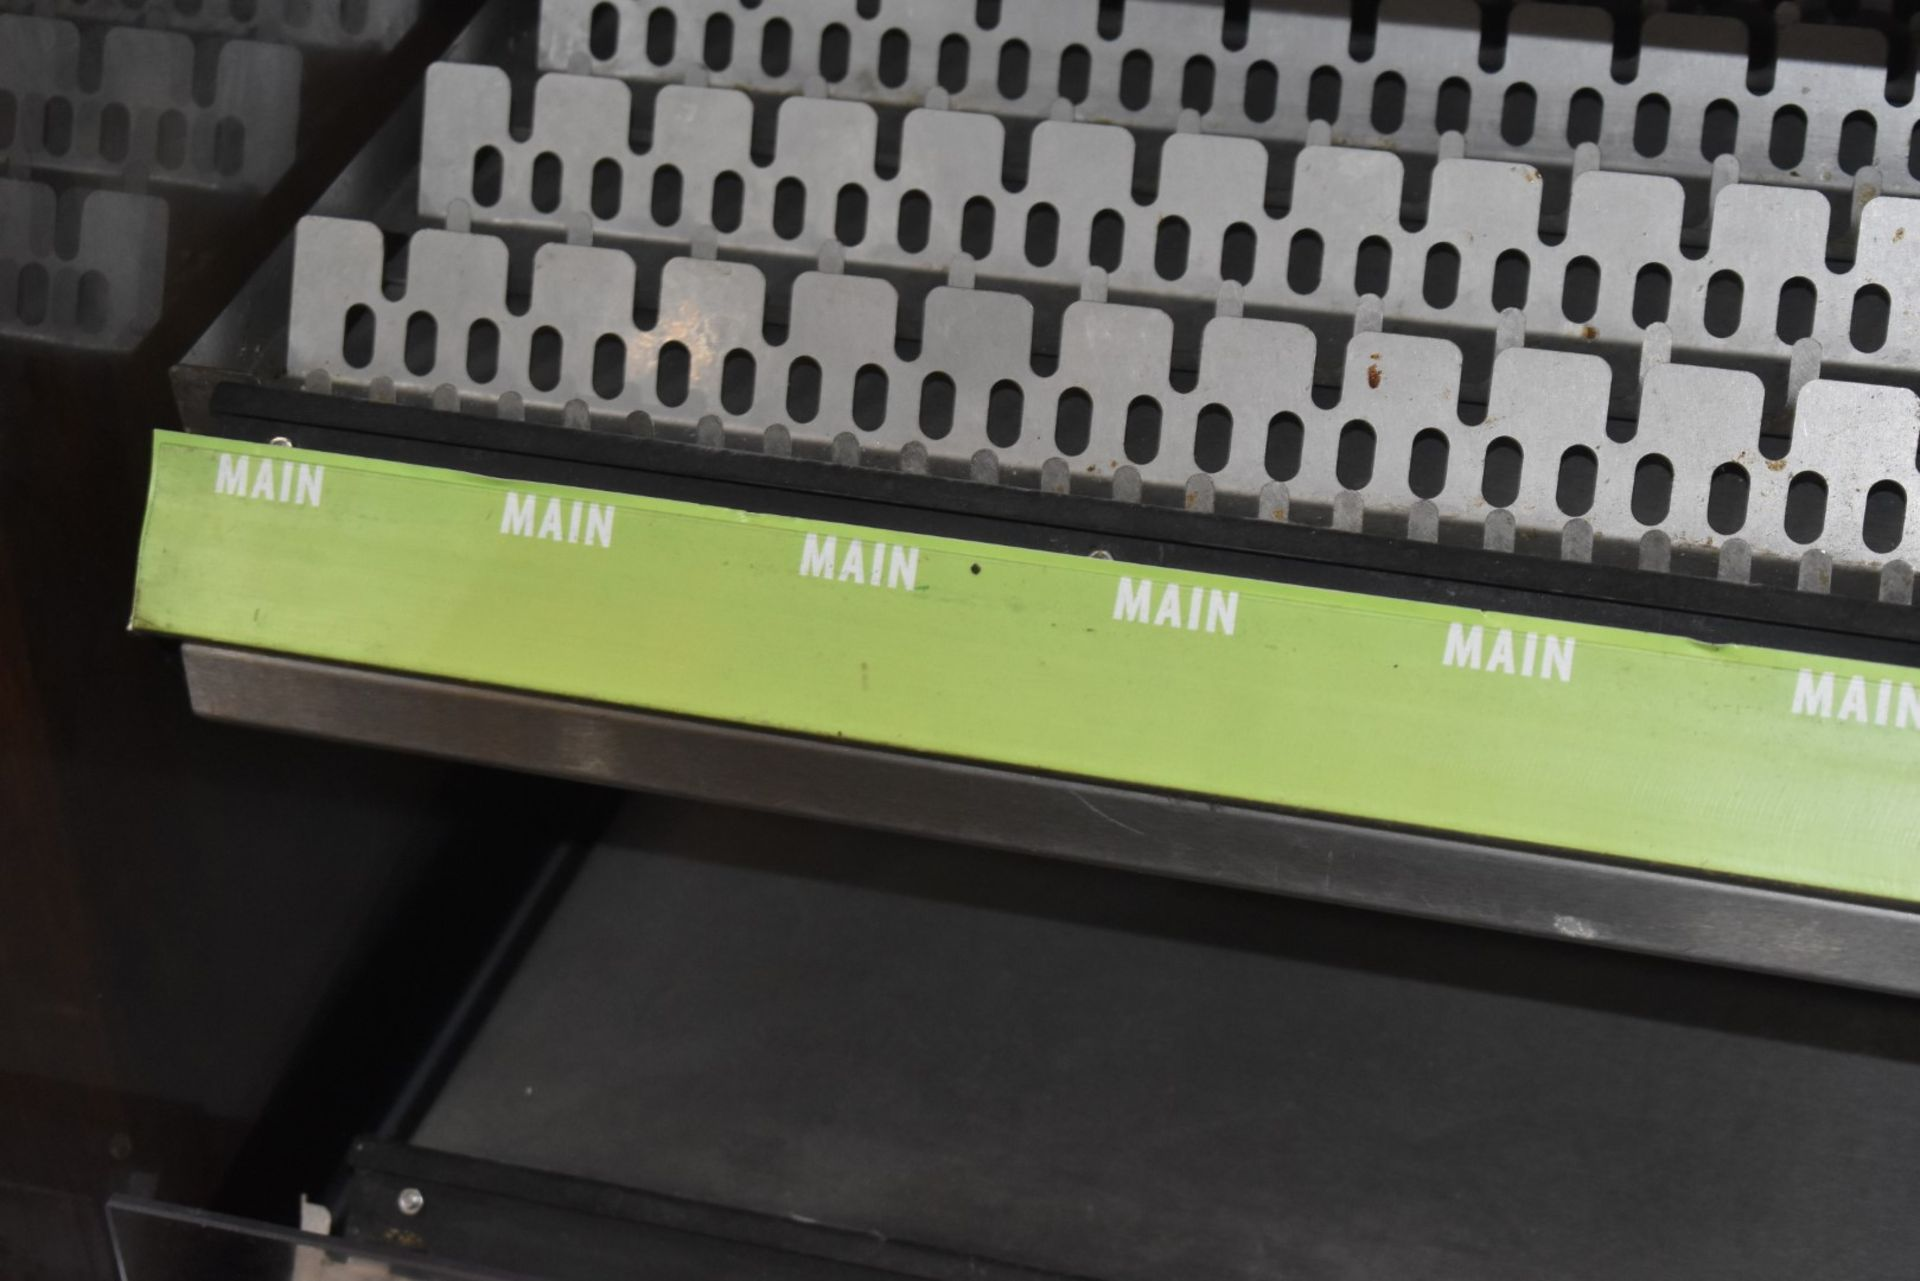 1 x Frijado Multi Deck 60 5 Level Heated Grab and Go Display Warmer - 400v 3 Phase - H197 x W60 x - Image 4 of 7